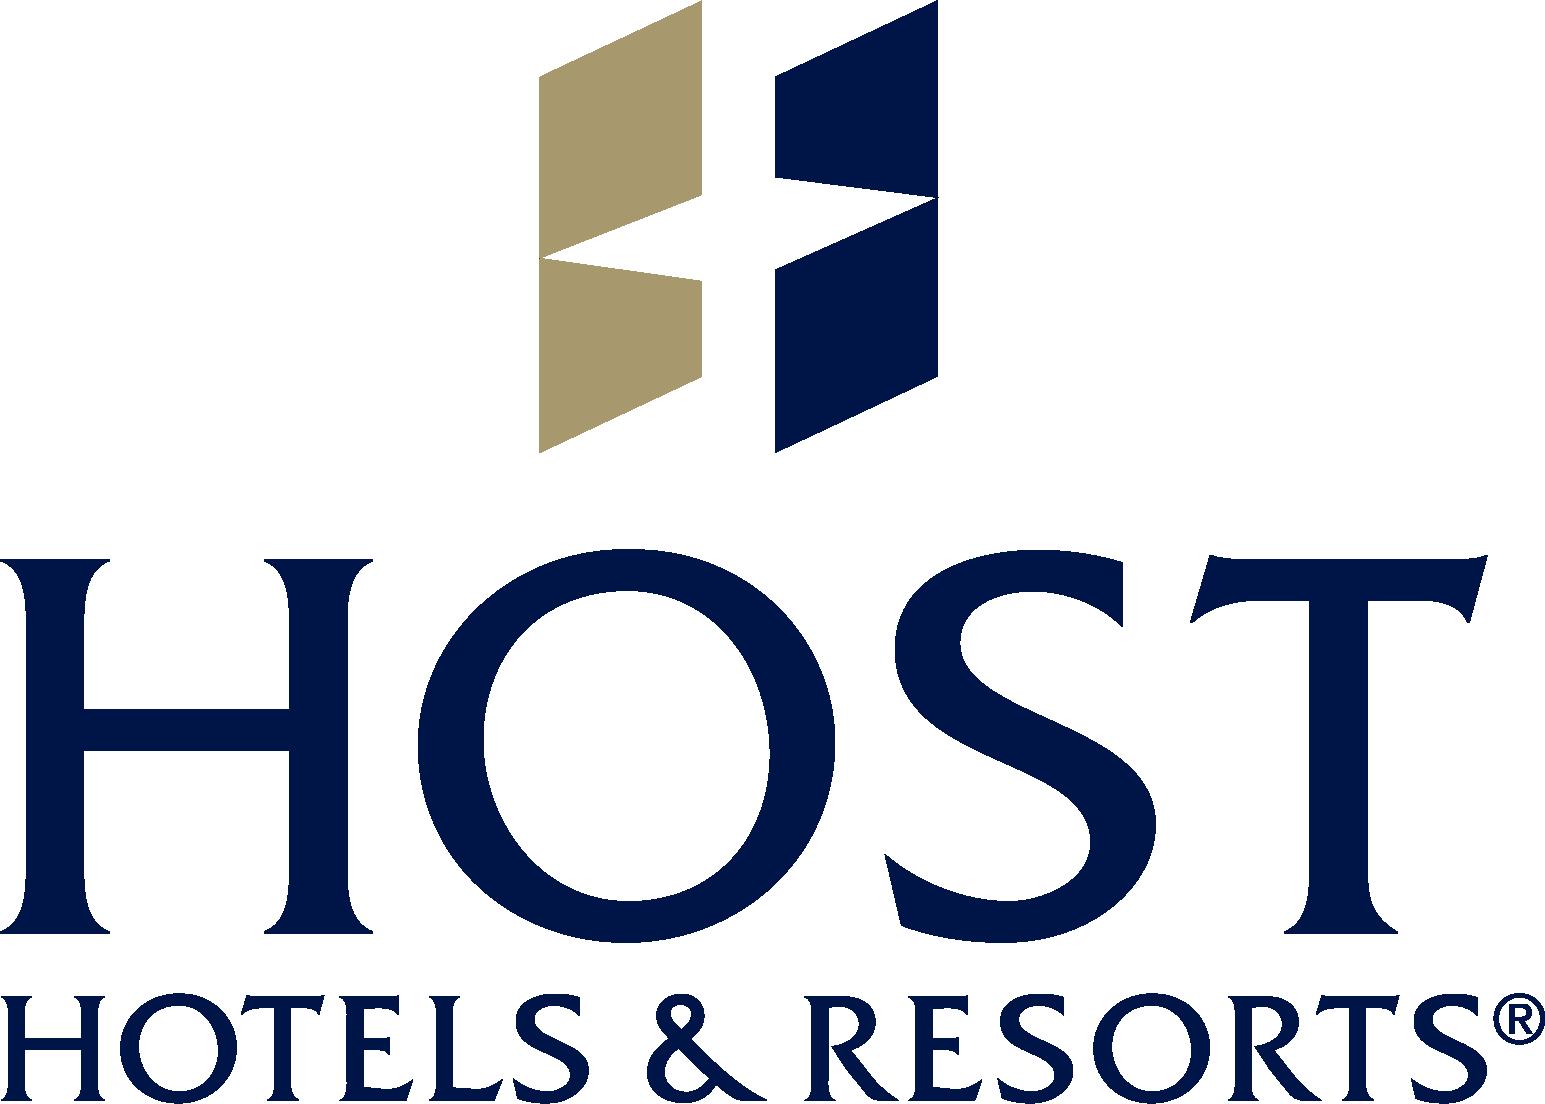 Host Hotels & Resorts Logo png